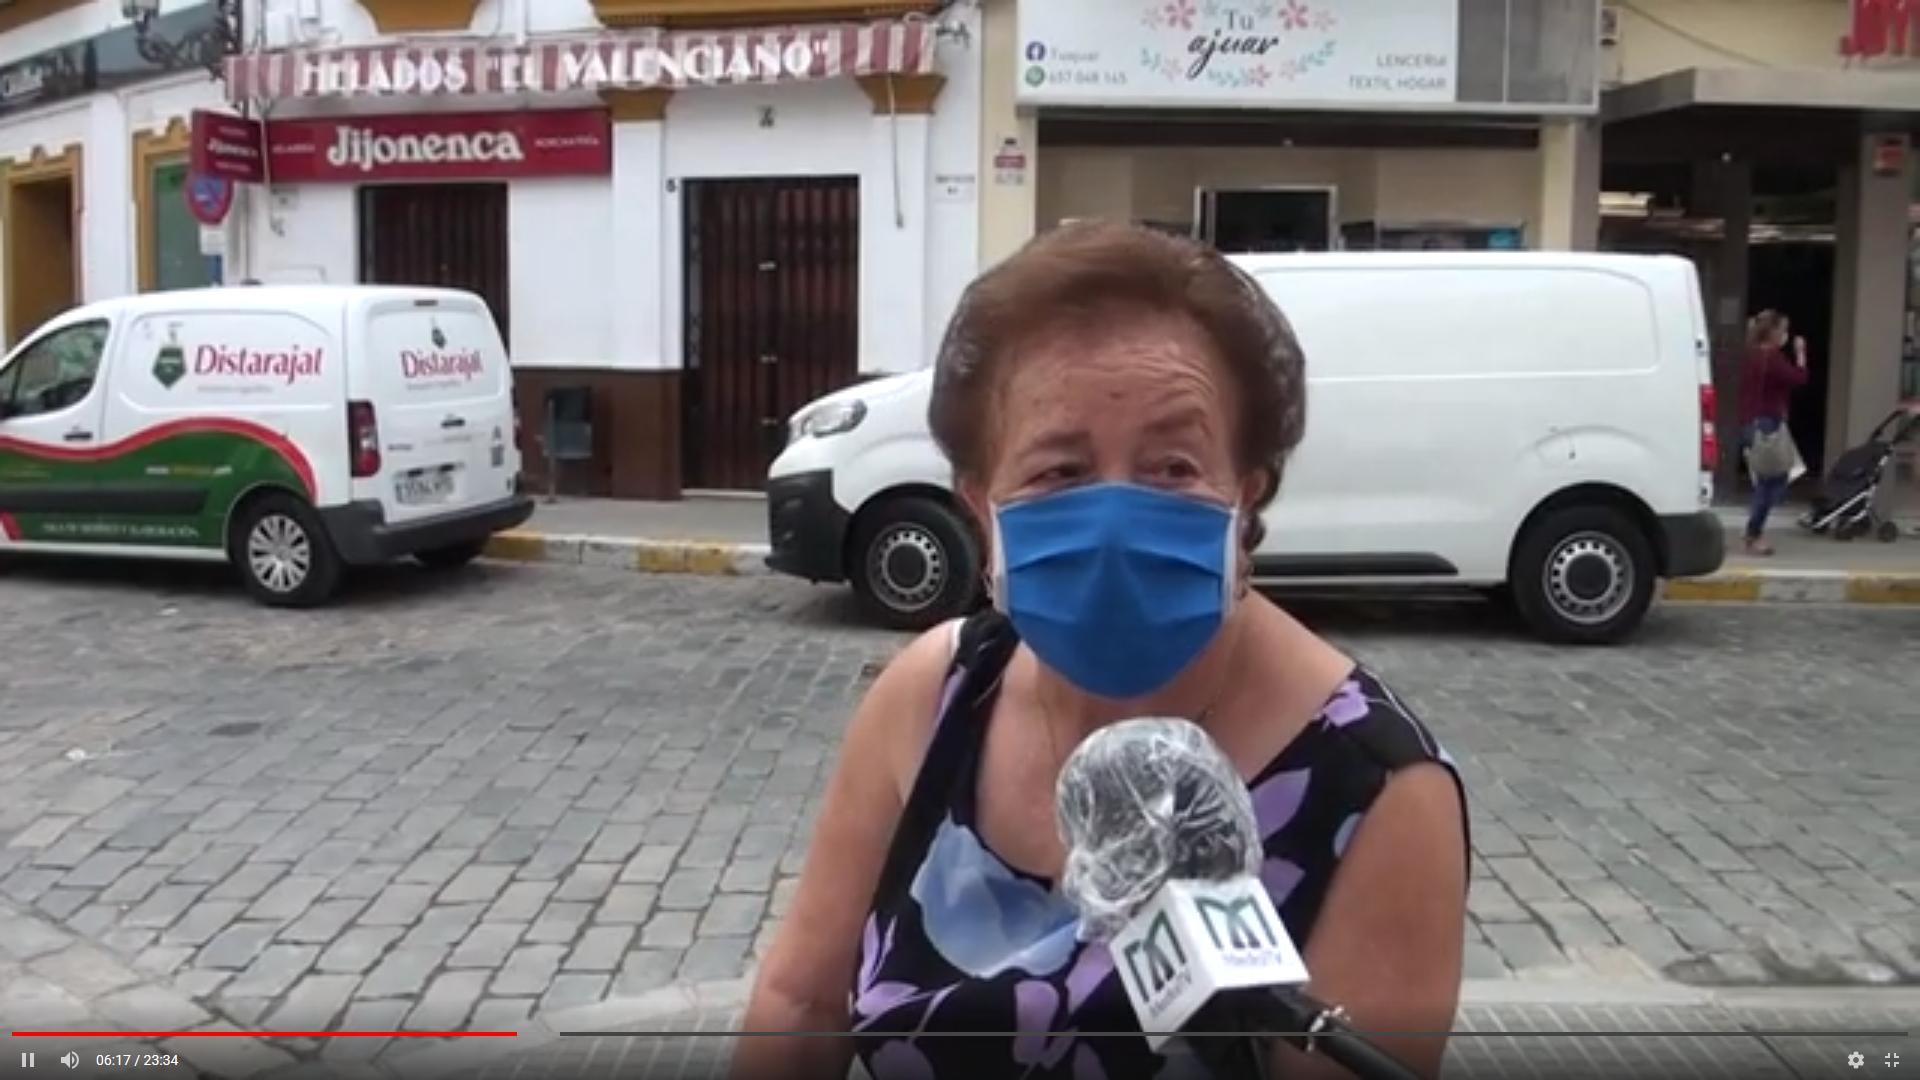 La calle opina – Vuelta al colegio coronavirus 2020